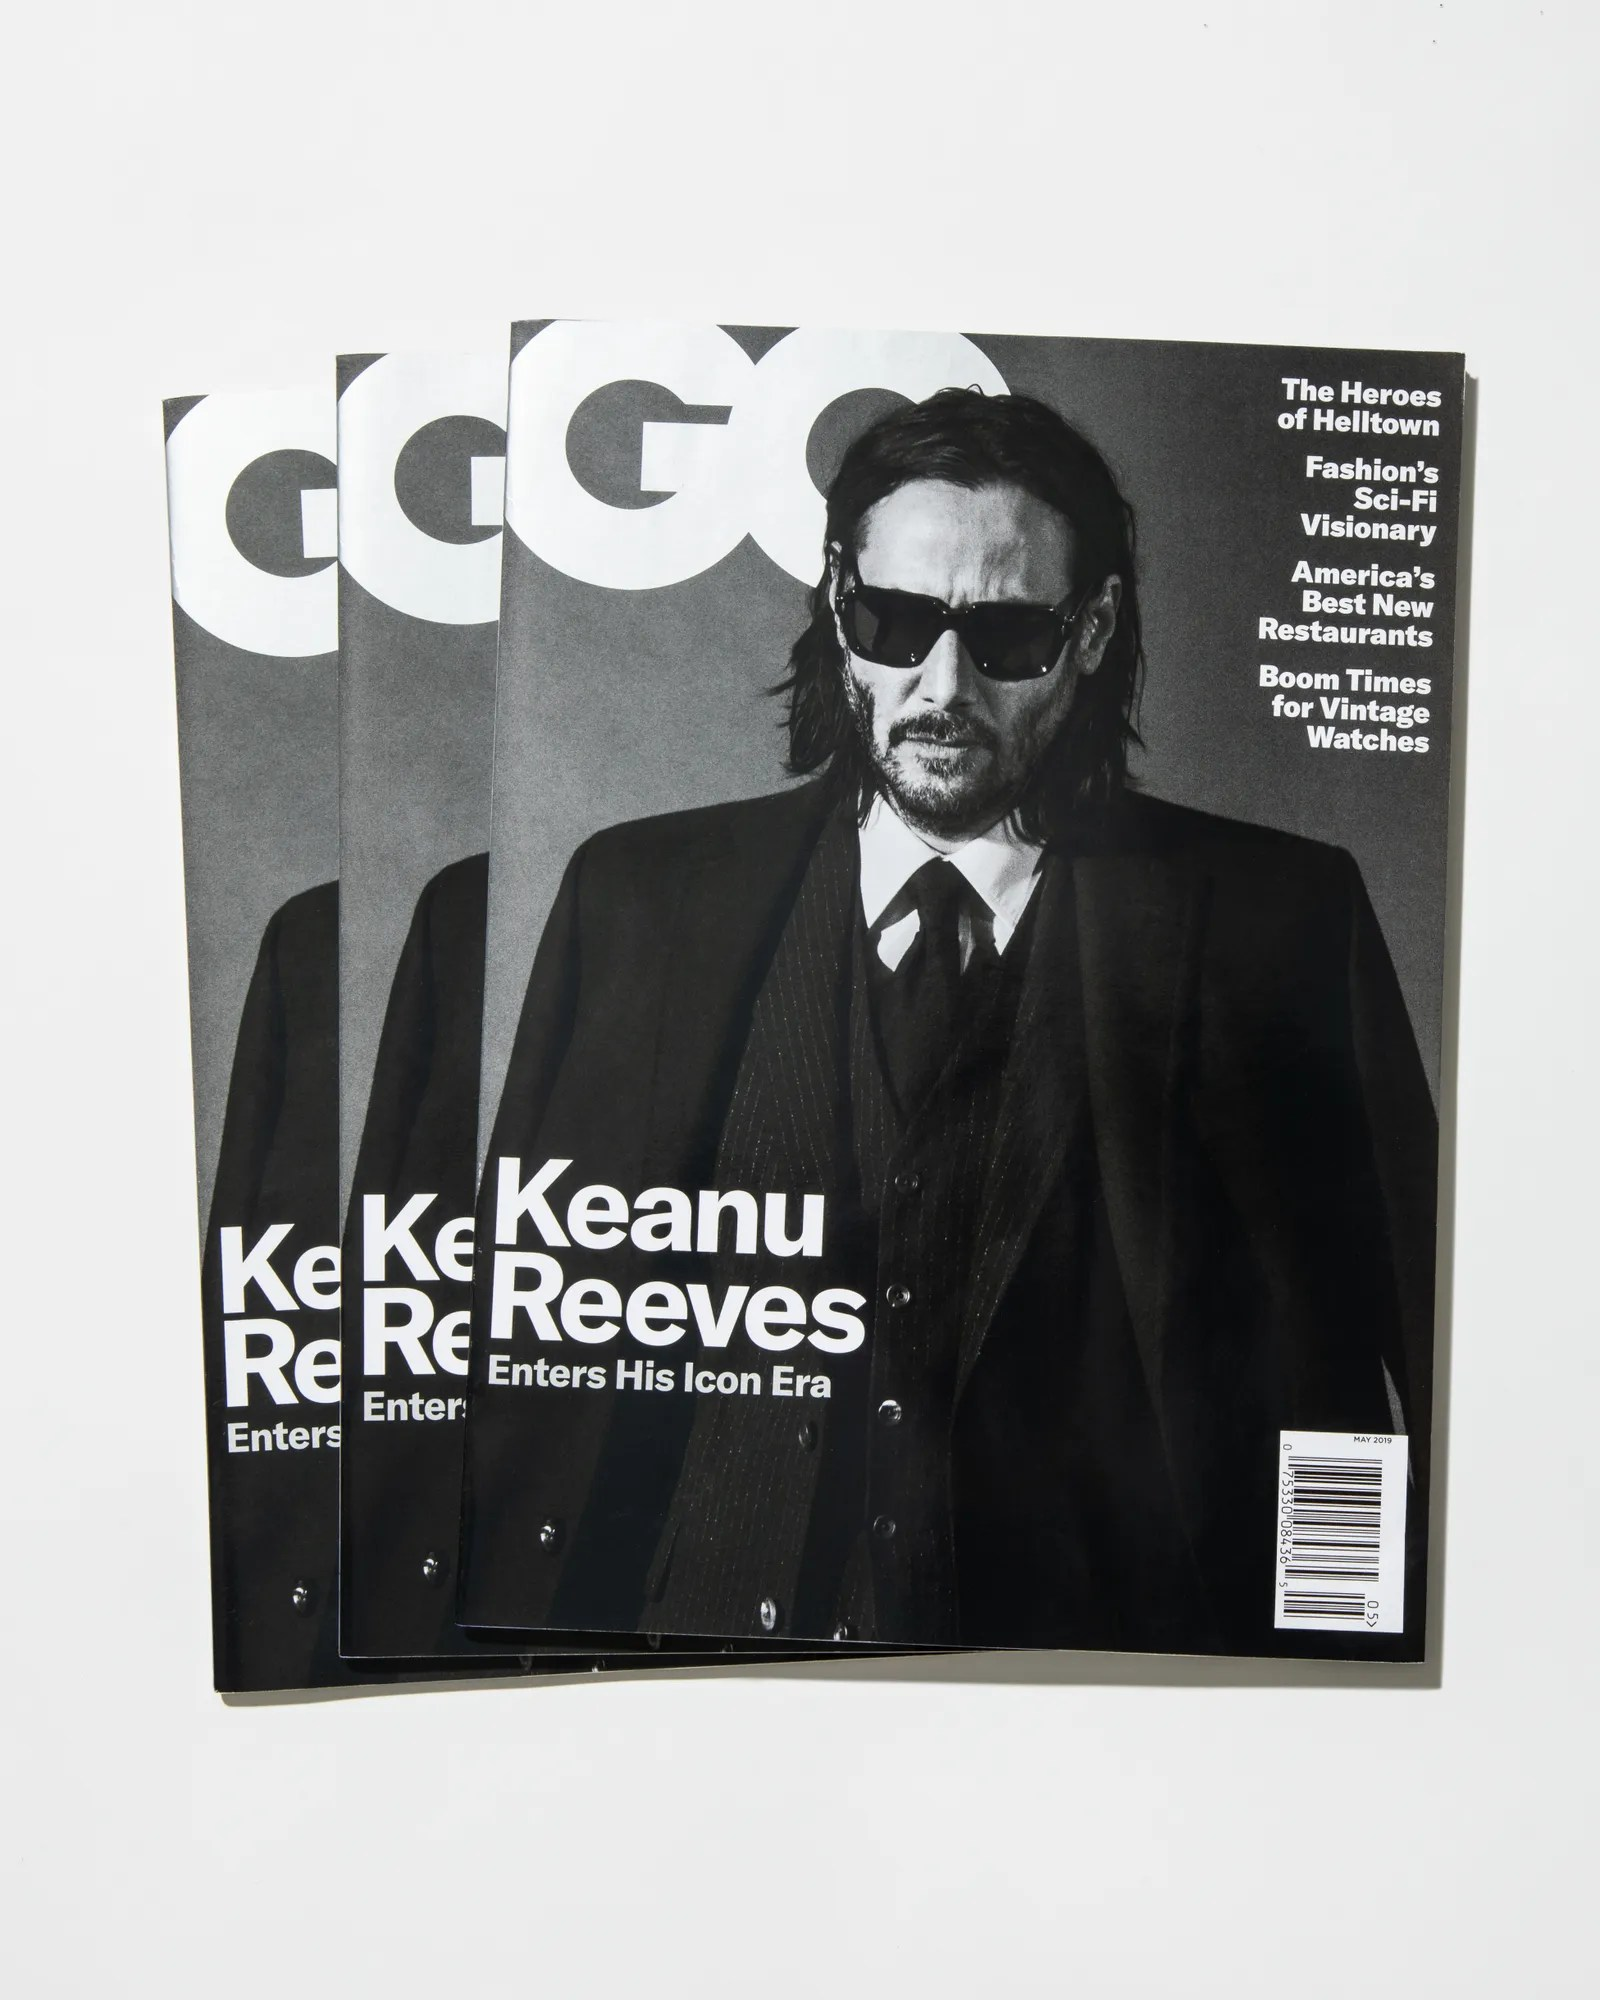 the legend of keanu